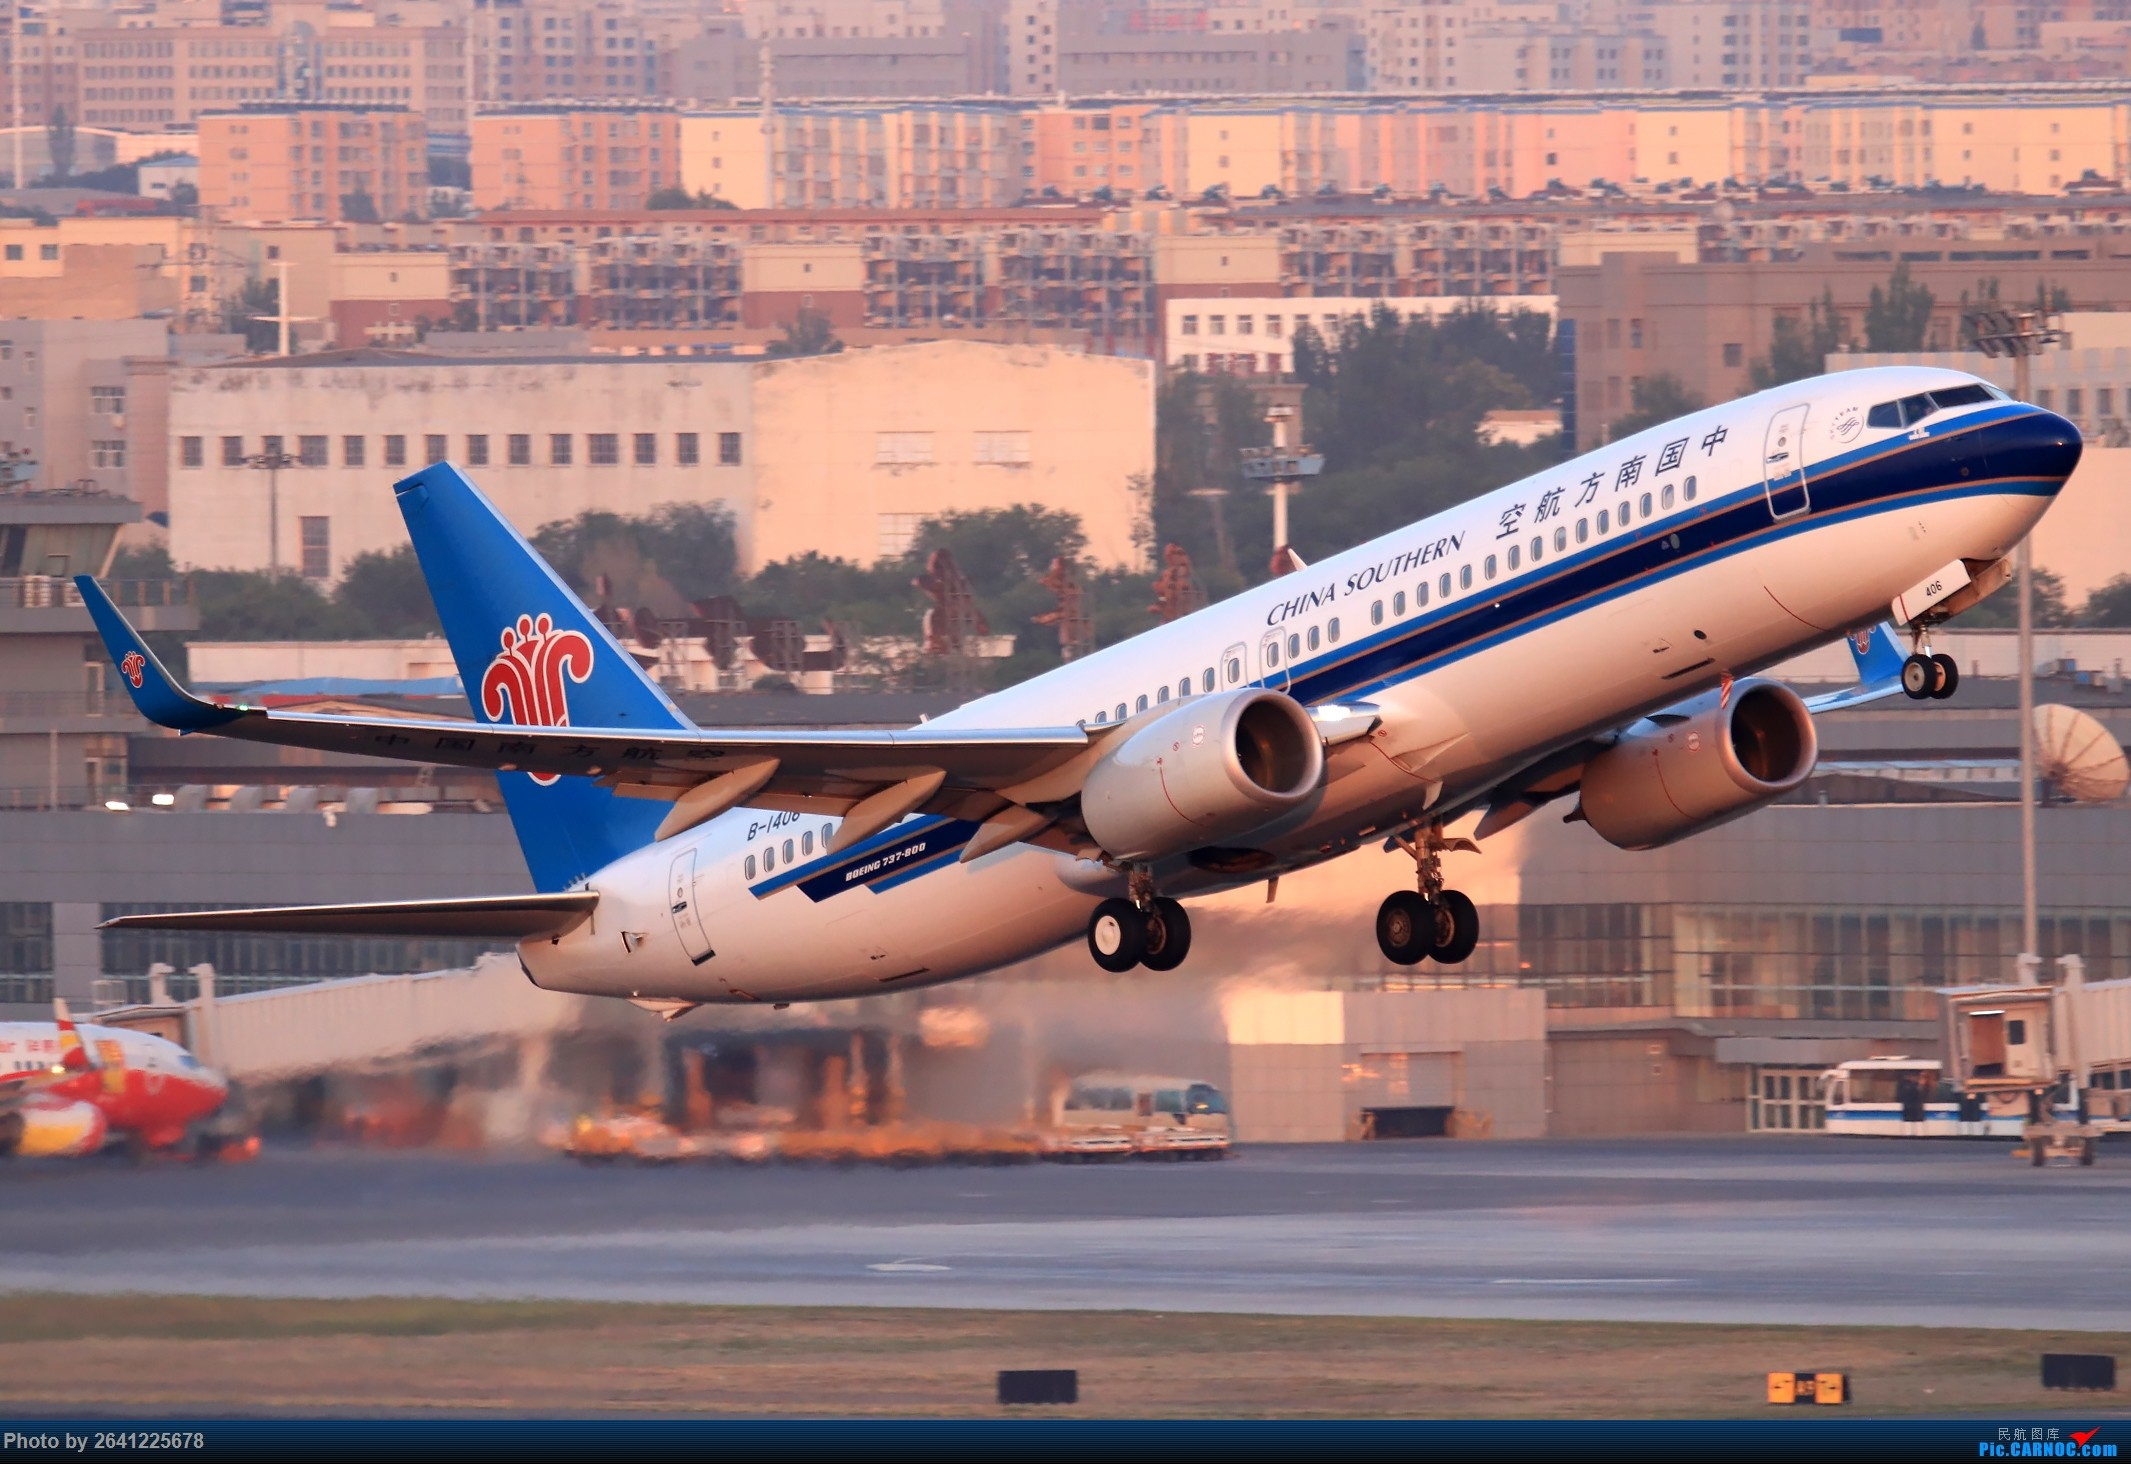 Re:[原创]【小周游记第7集拍机贴】乌鲁木齐绝美的地景和光线 BOEING 737-800 B-1406 中国乌鲁木齐地窝堡国际机场